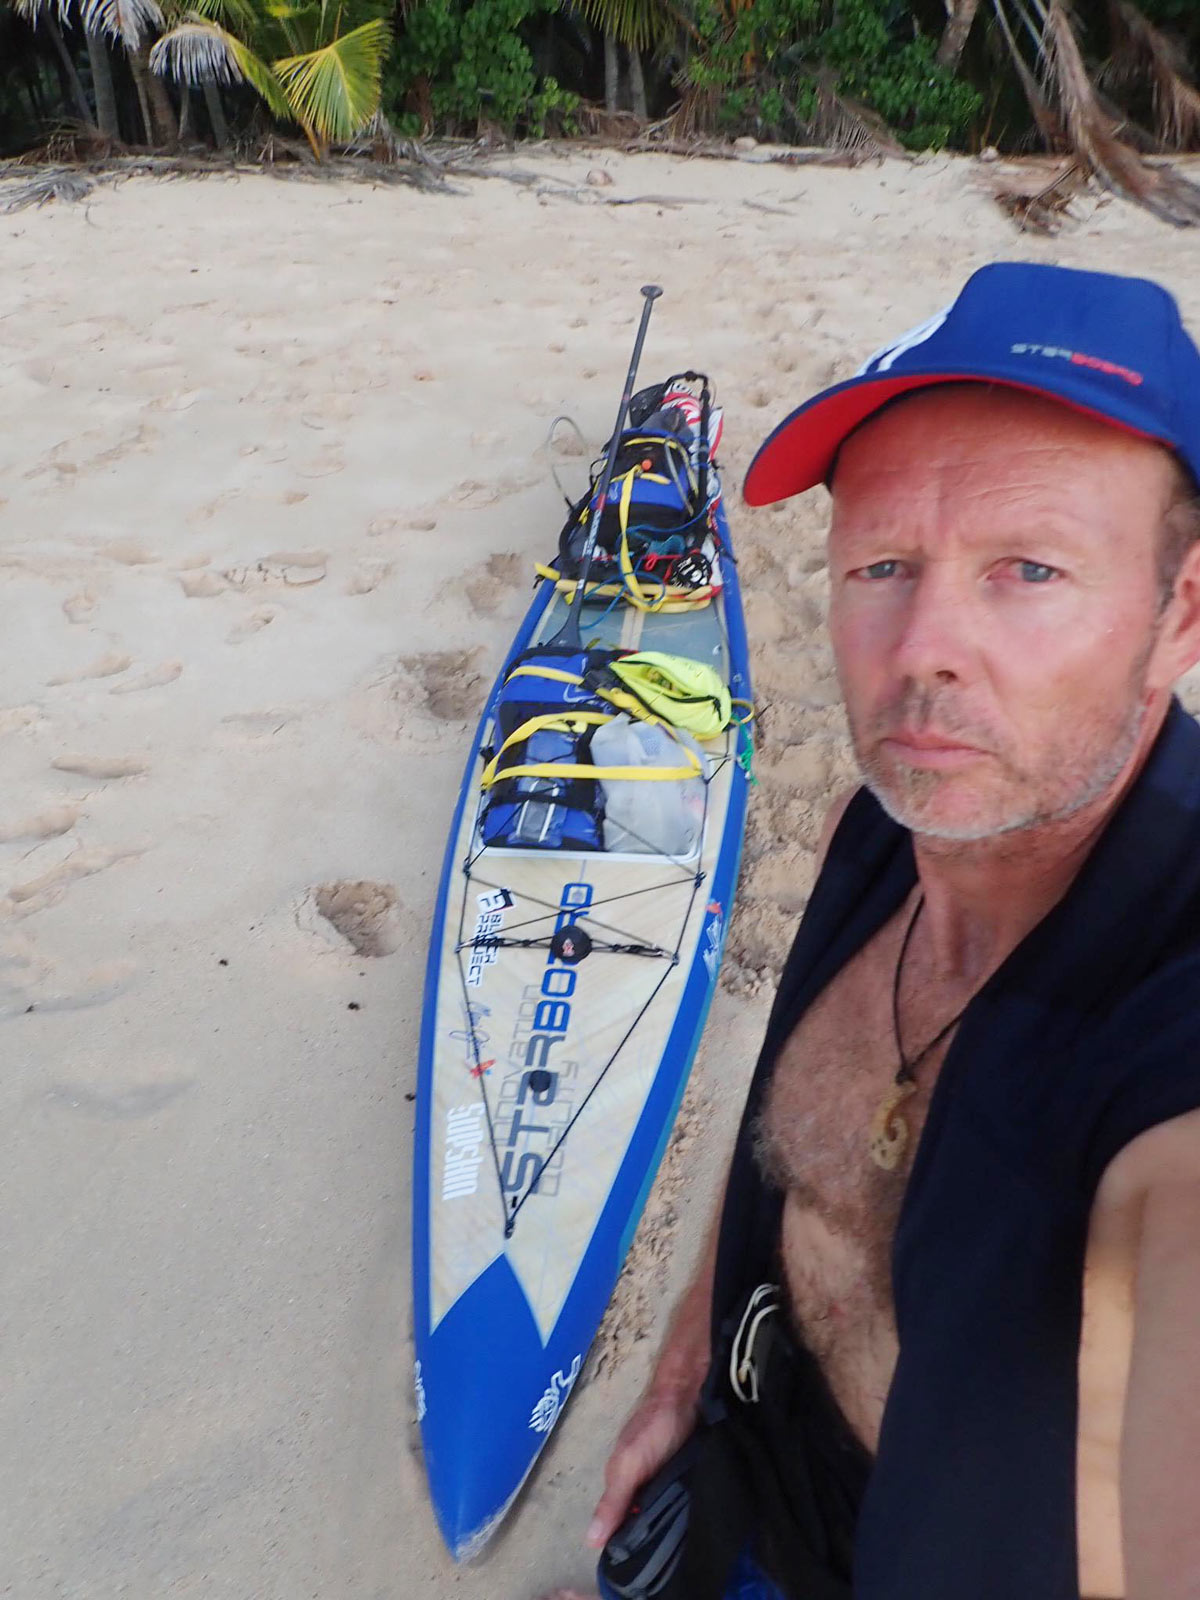 Marquesas-Island-Expedition-Bart-de-Zwarts-Daily-Journal-6